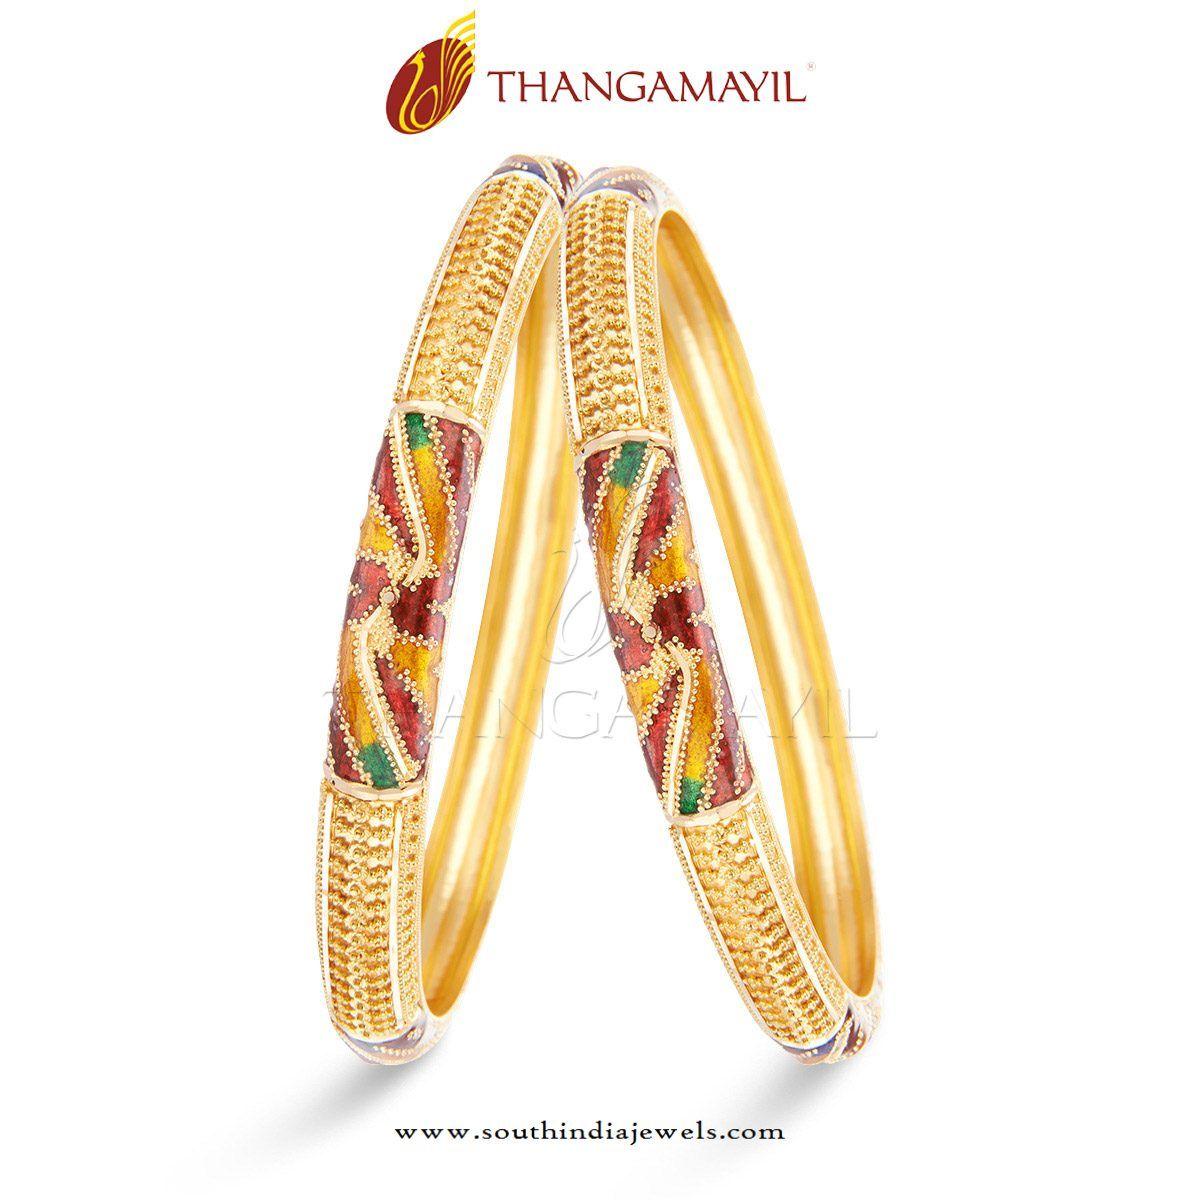 8e8912f5ea75e Gold Bangles with Enamel Work | Bangles Collections | Gold bangles ...